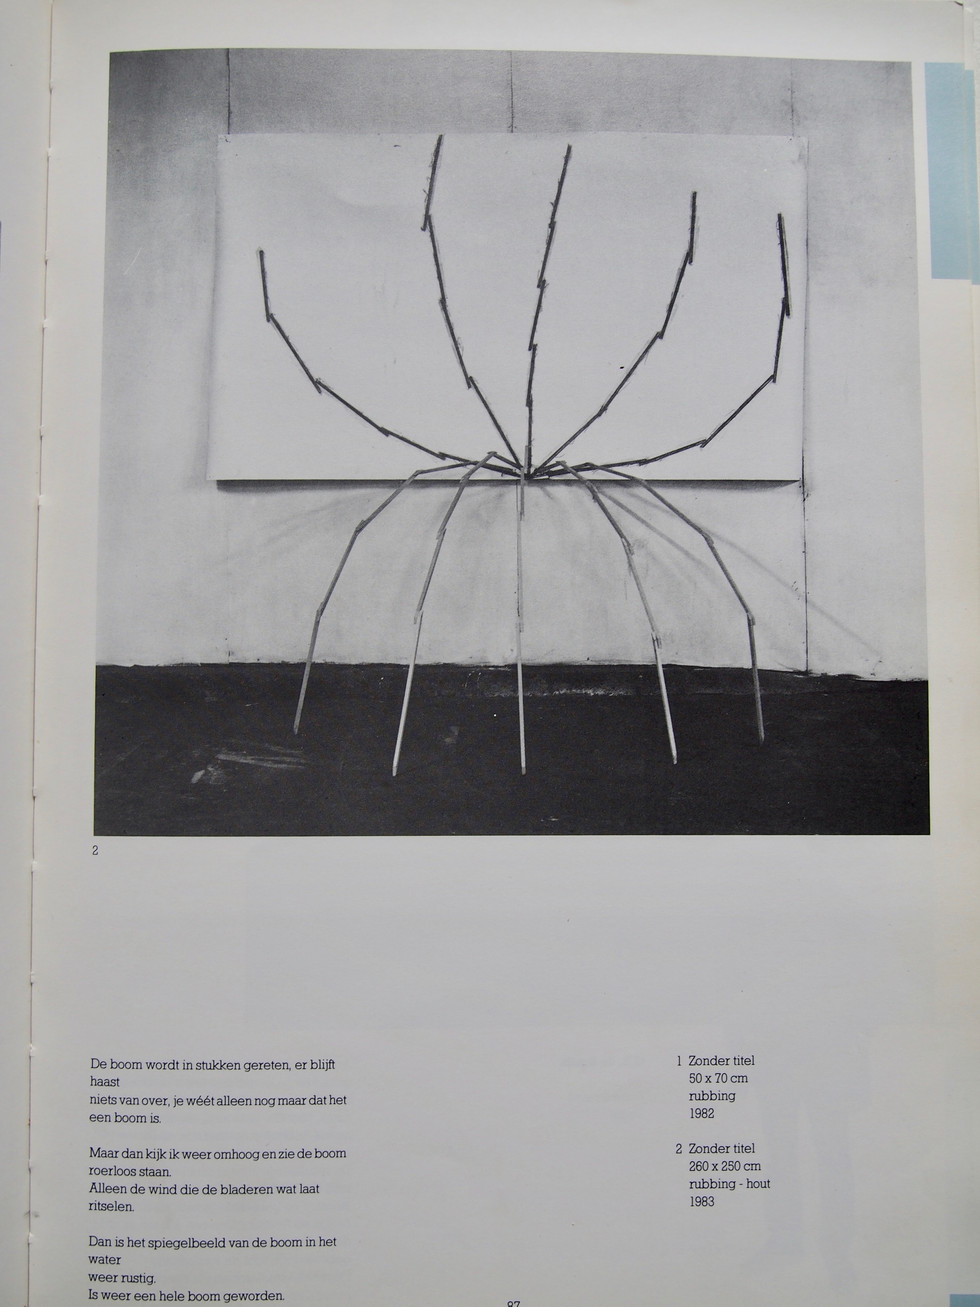 1.1983 catalogus rechts.jpg